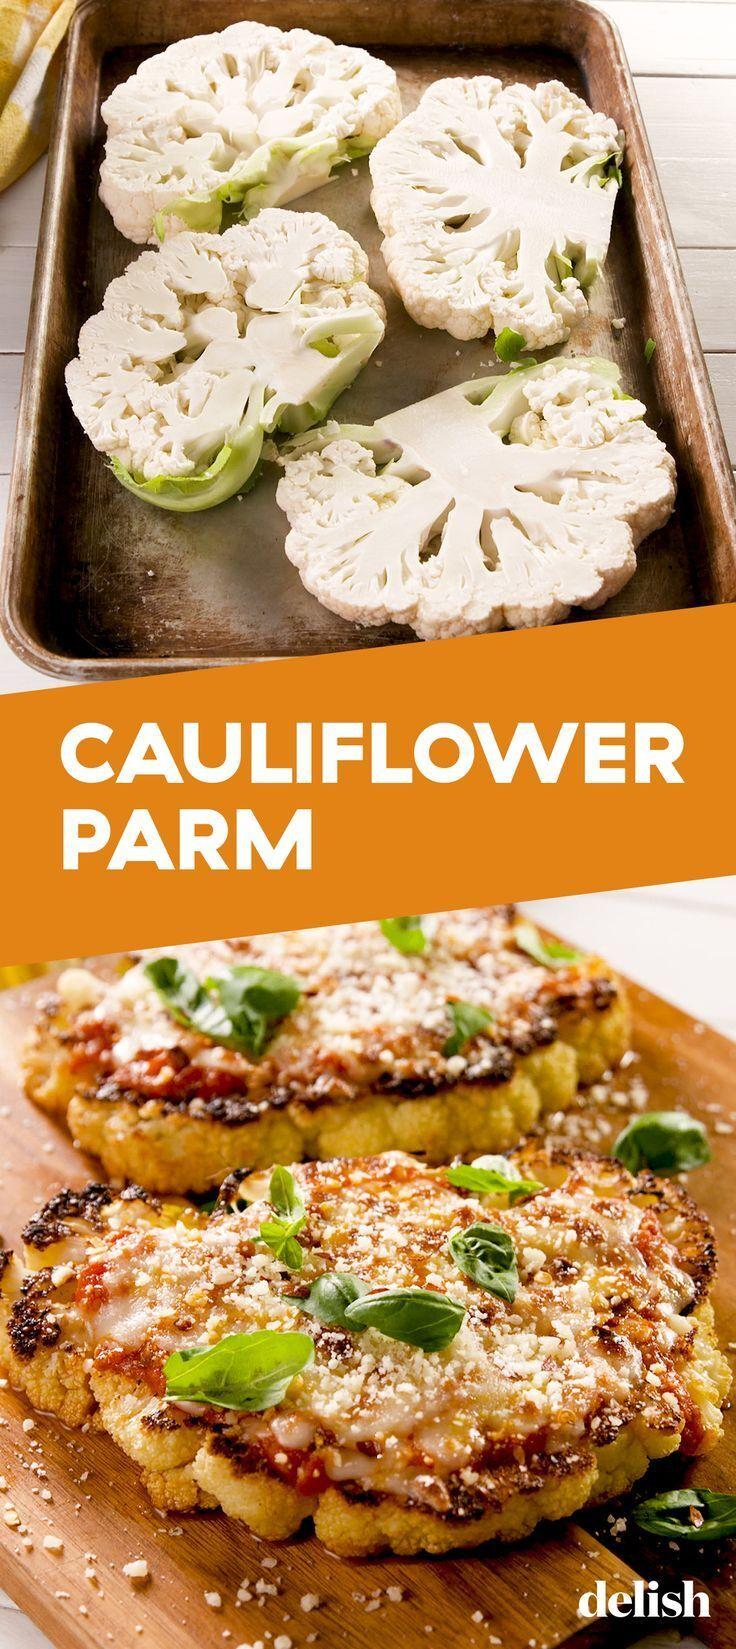 Cauliflower Parmesan